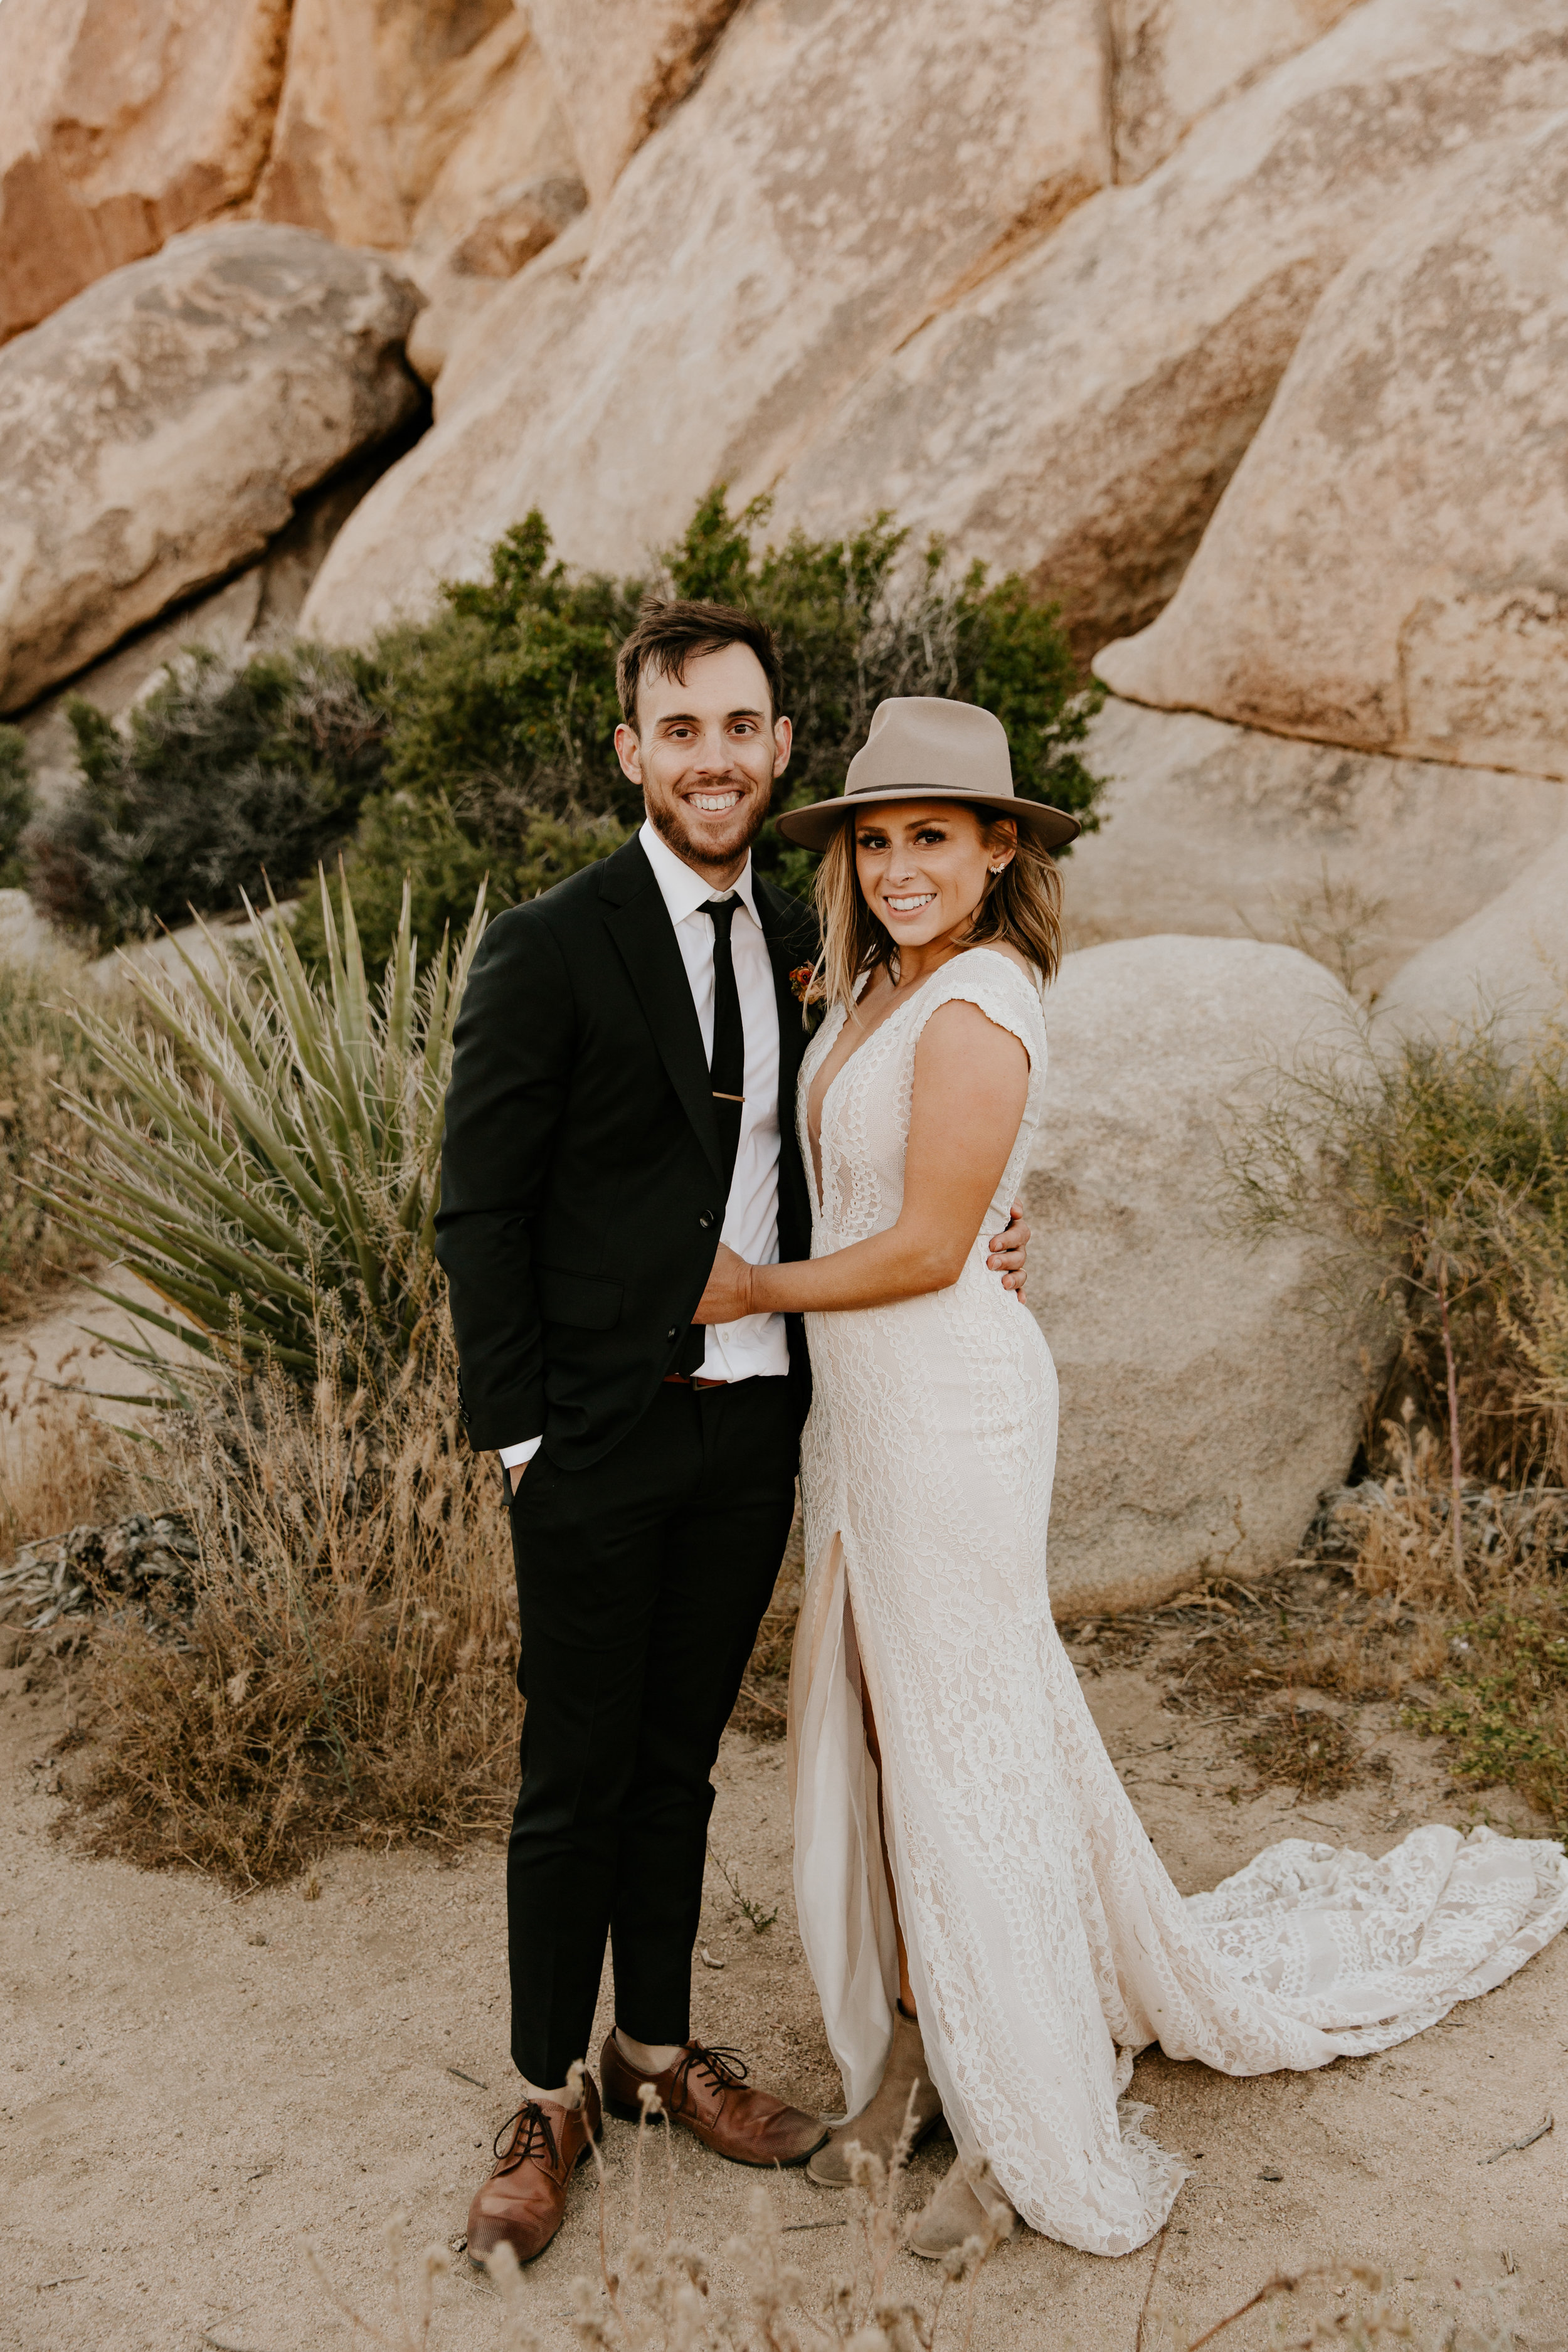 2019-05-26_Callie-Evan_Wedding_Joshua Tree_Paige Nelson_PREVIEWS HR-57.jpg